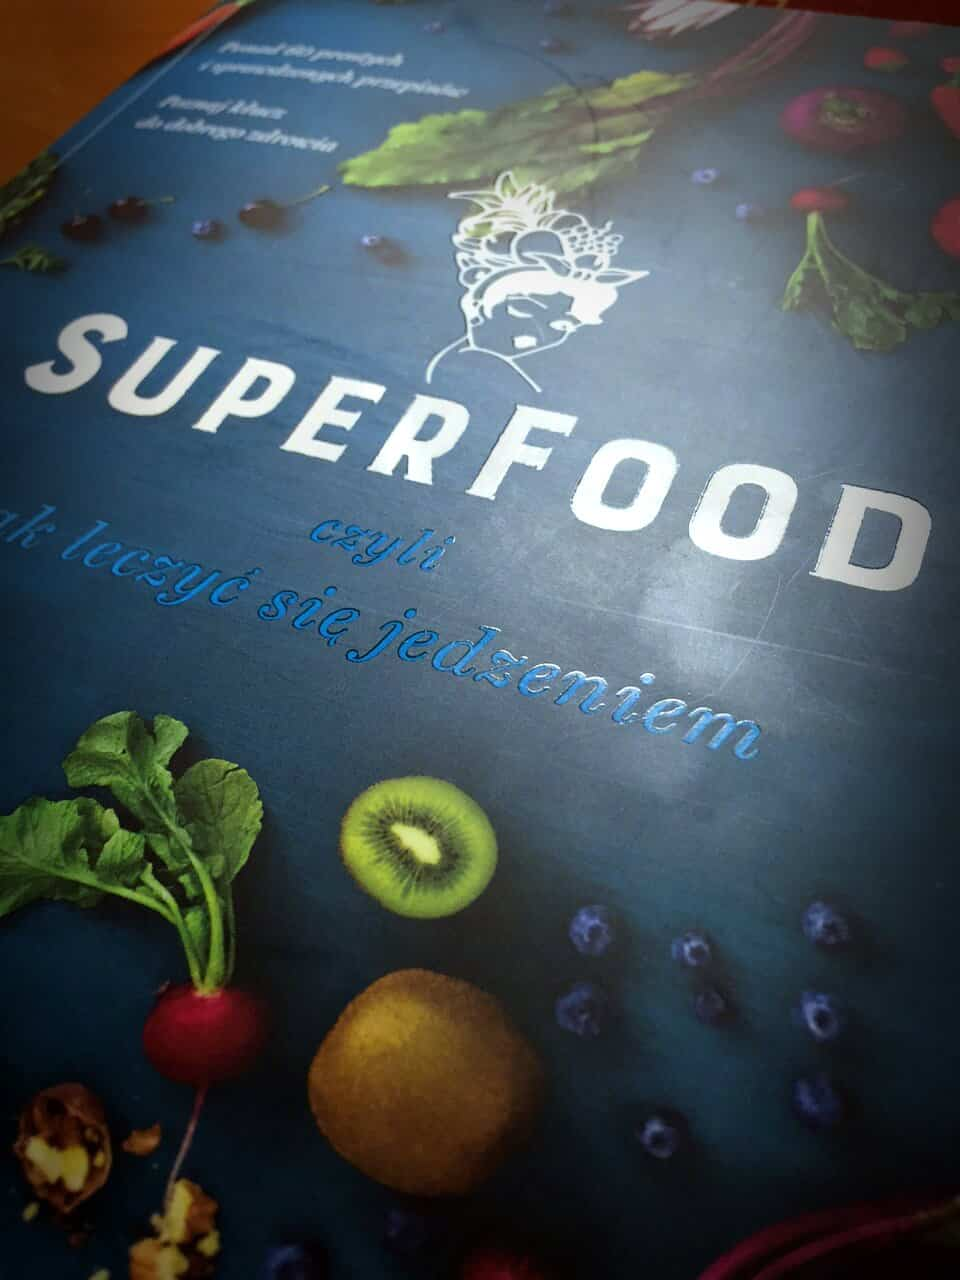 superfoods sophie manolas 2 (1)